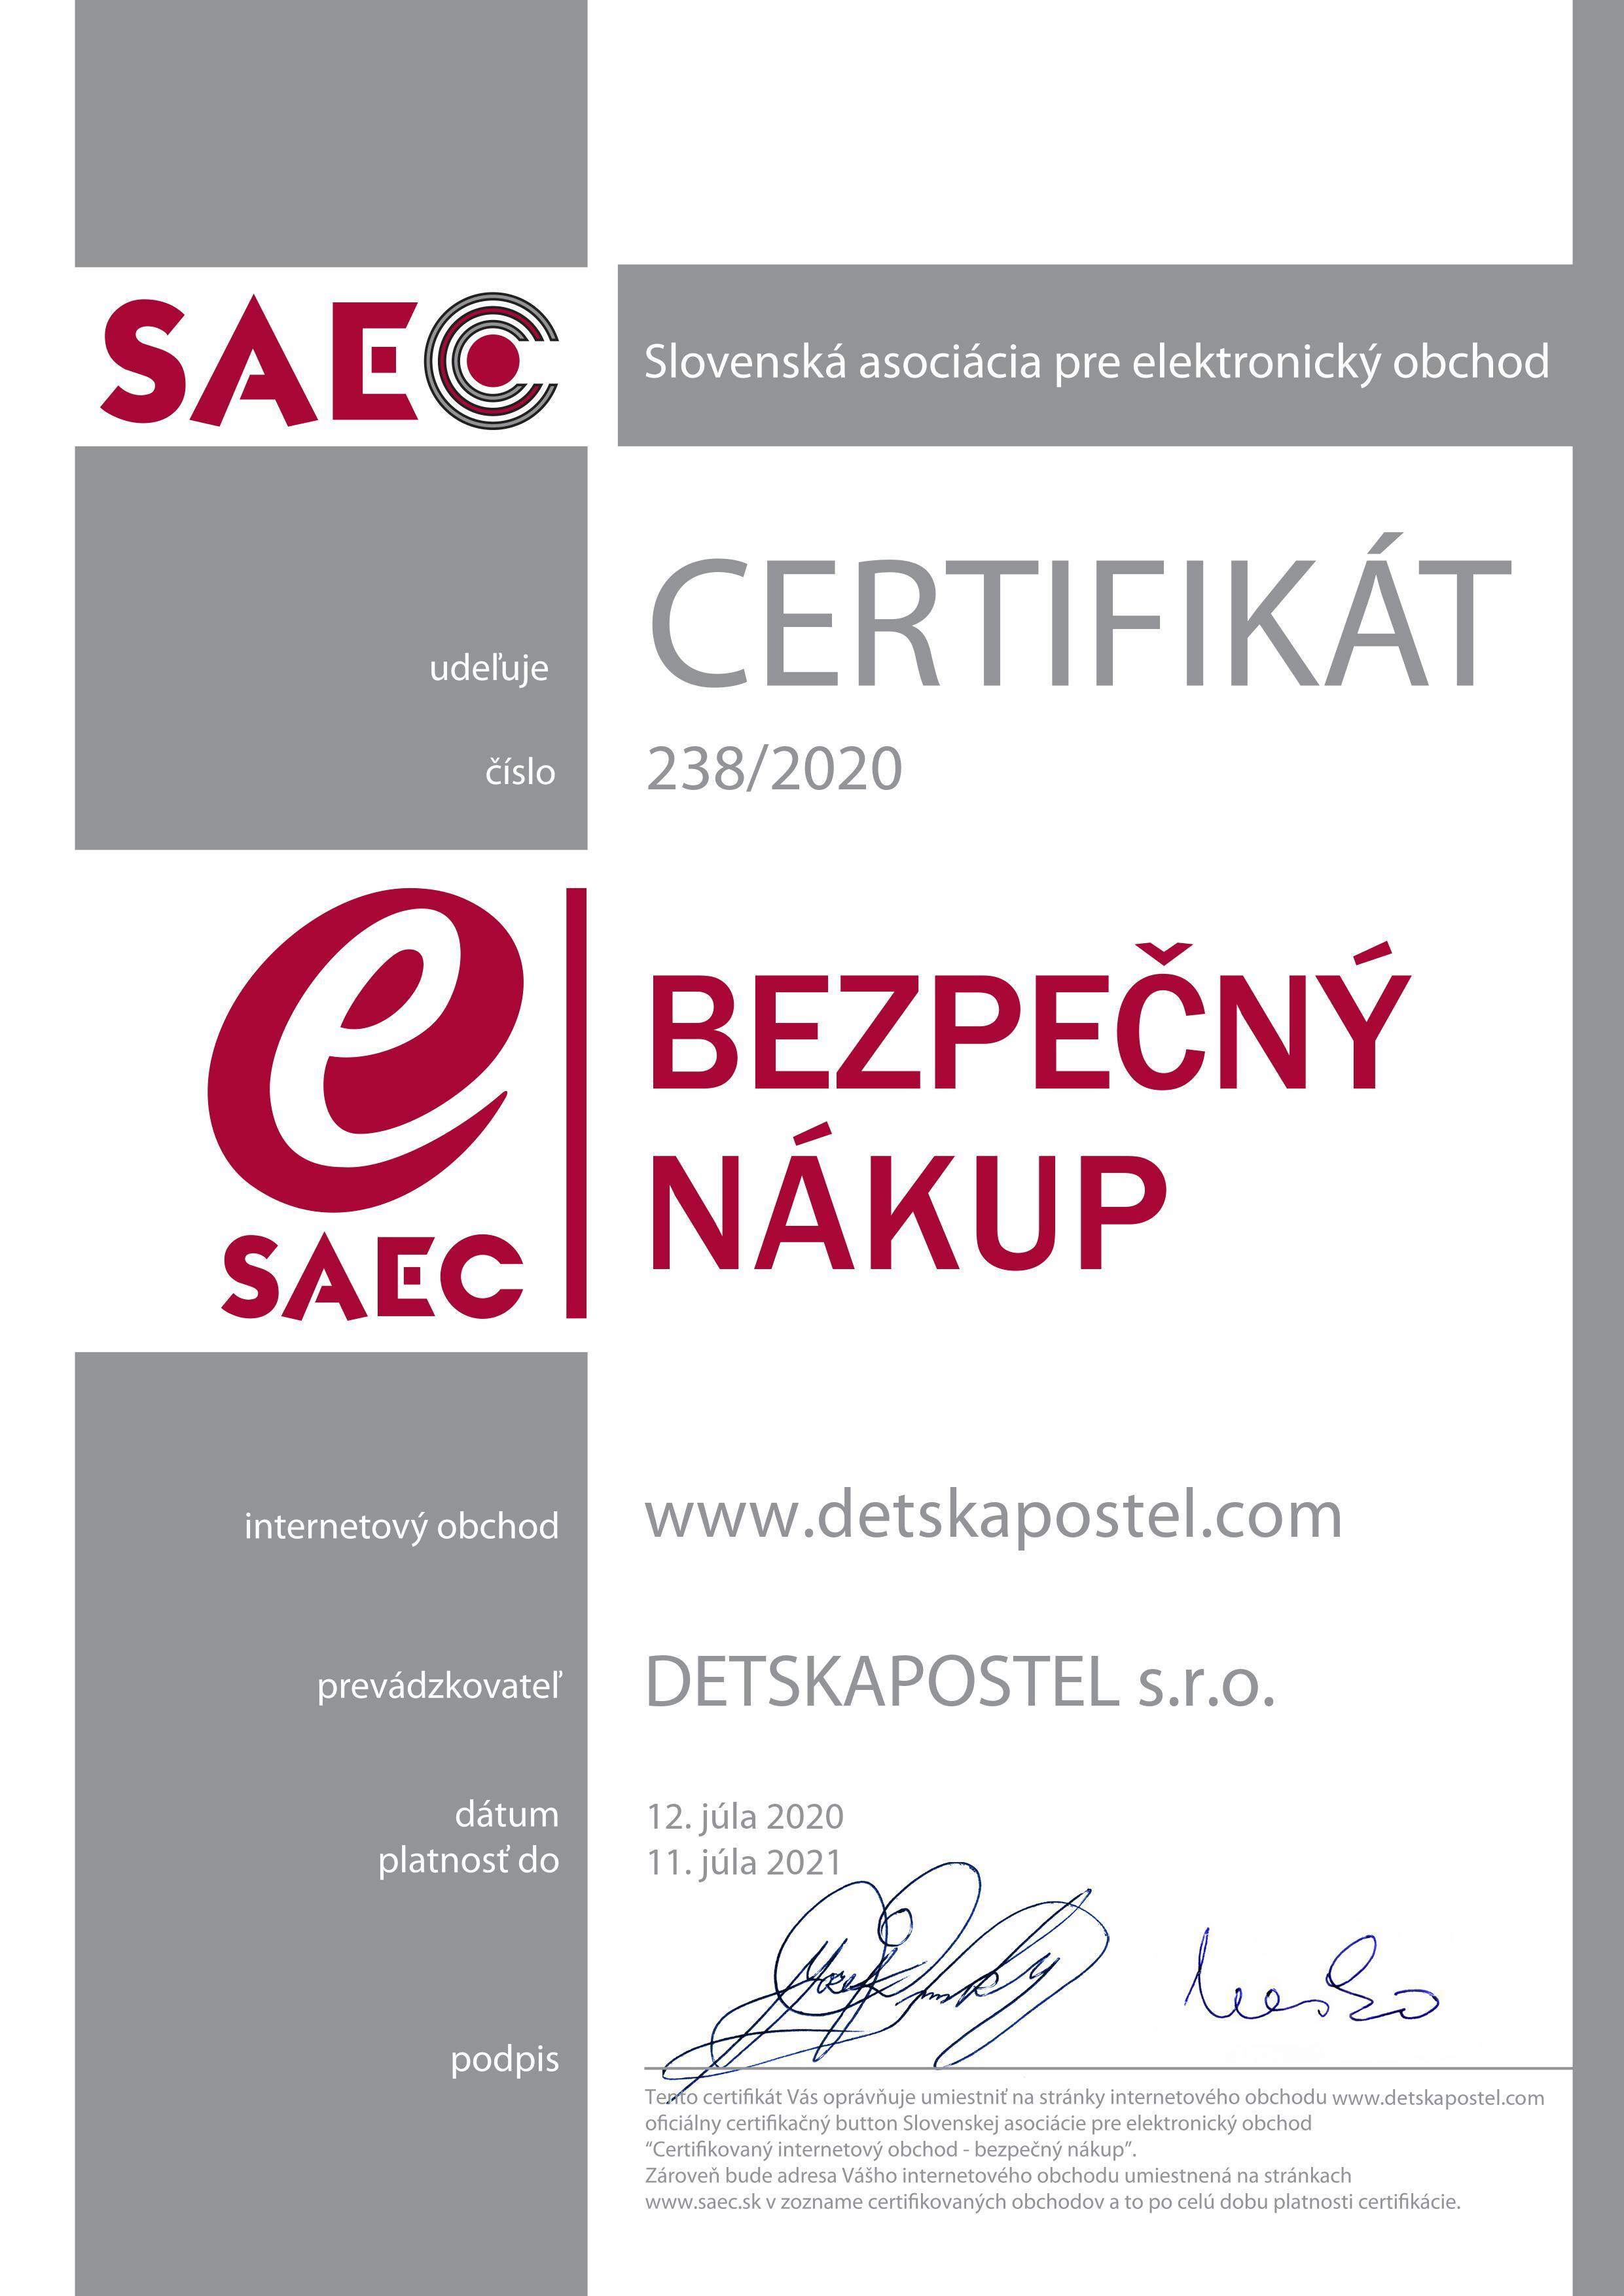 SAEC - bezpečný nákup certifikát